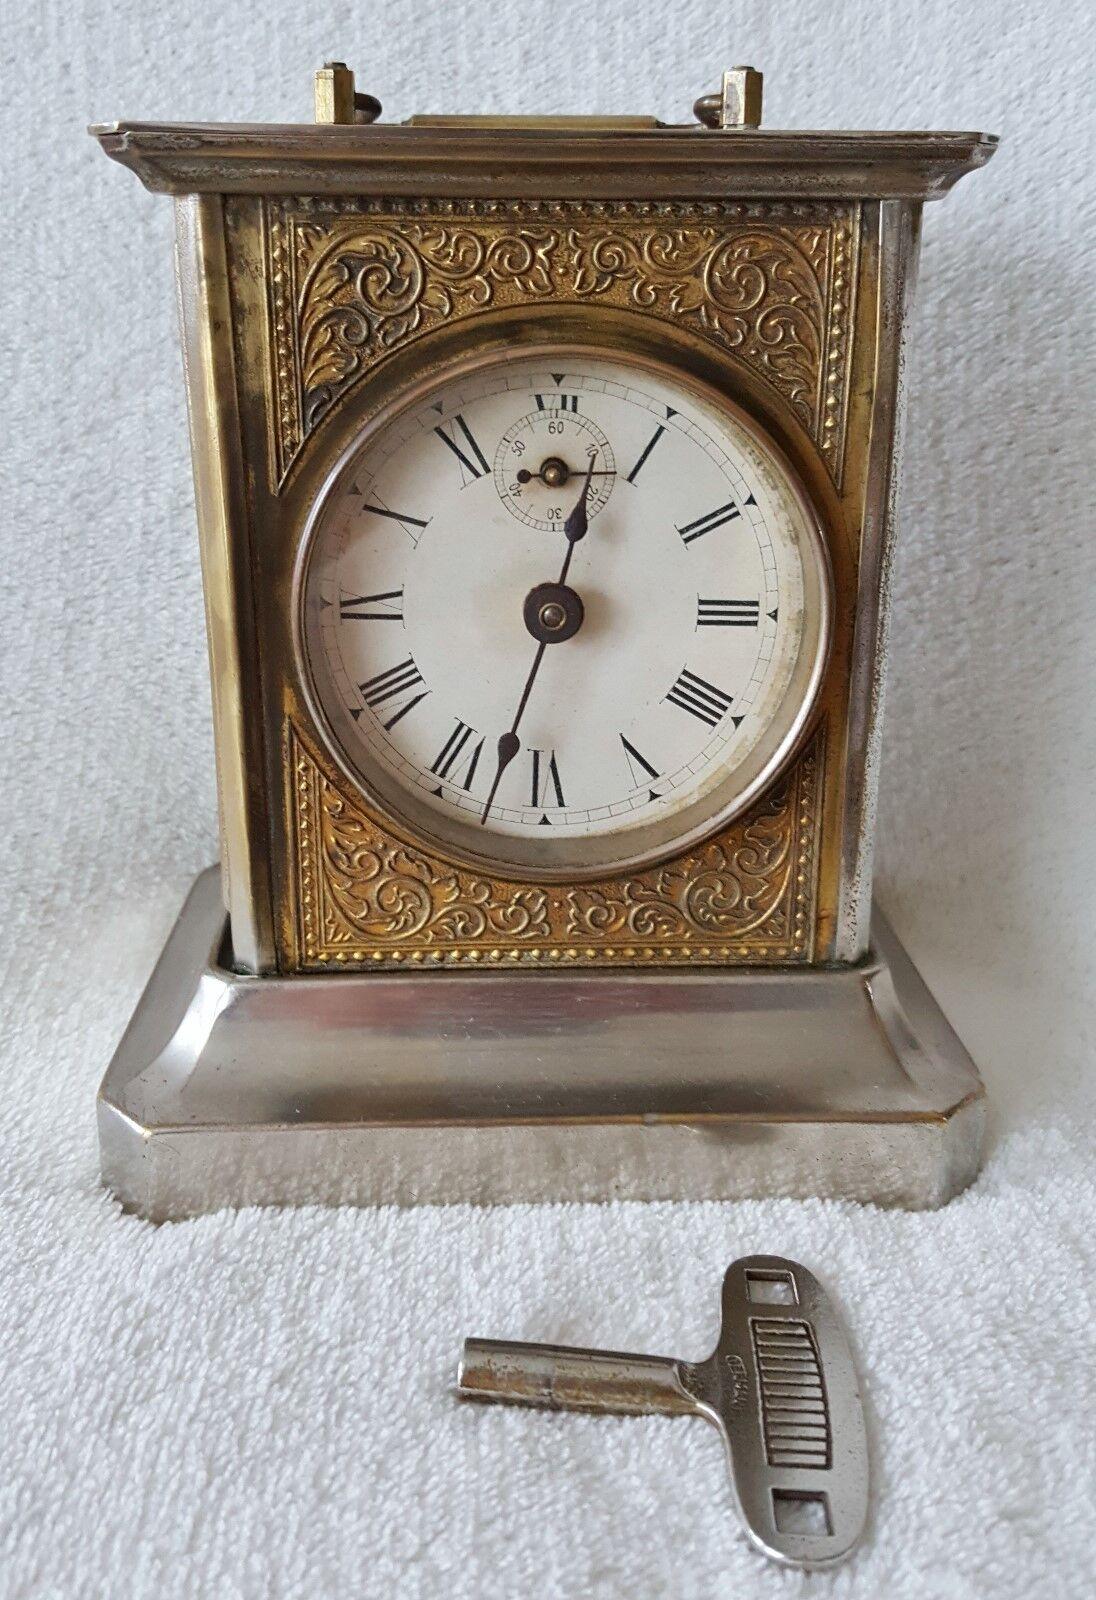 Rare Clock Pfeilkreuz German Musical Alarm Carriage Mantel Alarm Clock 1920s